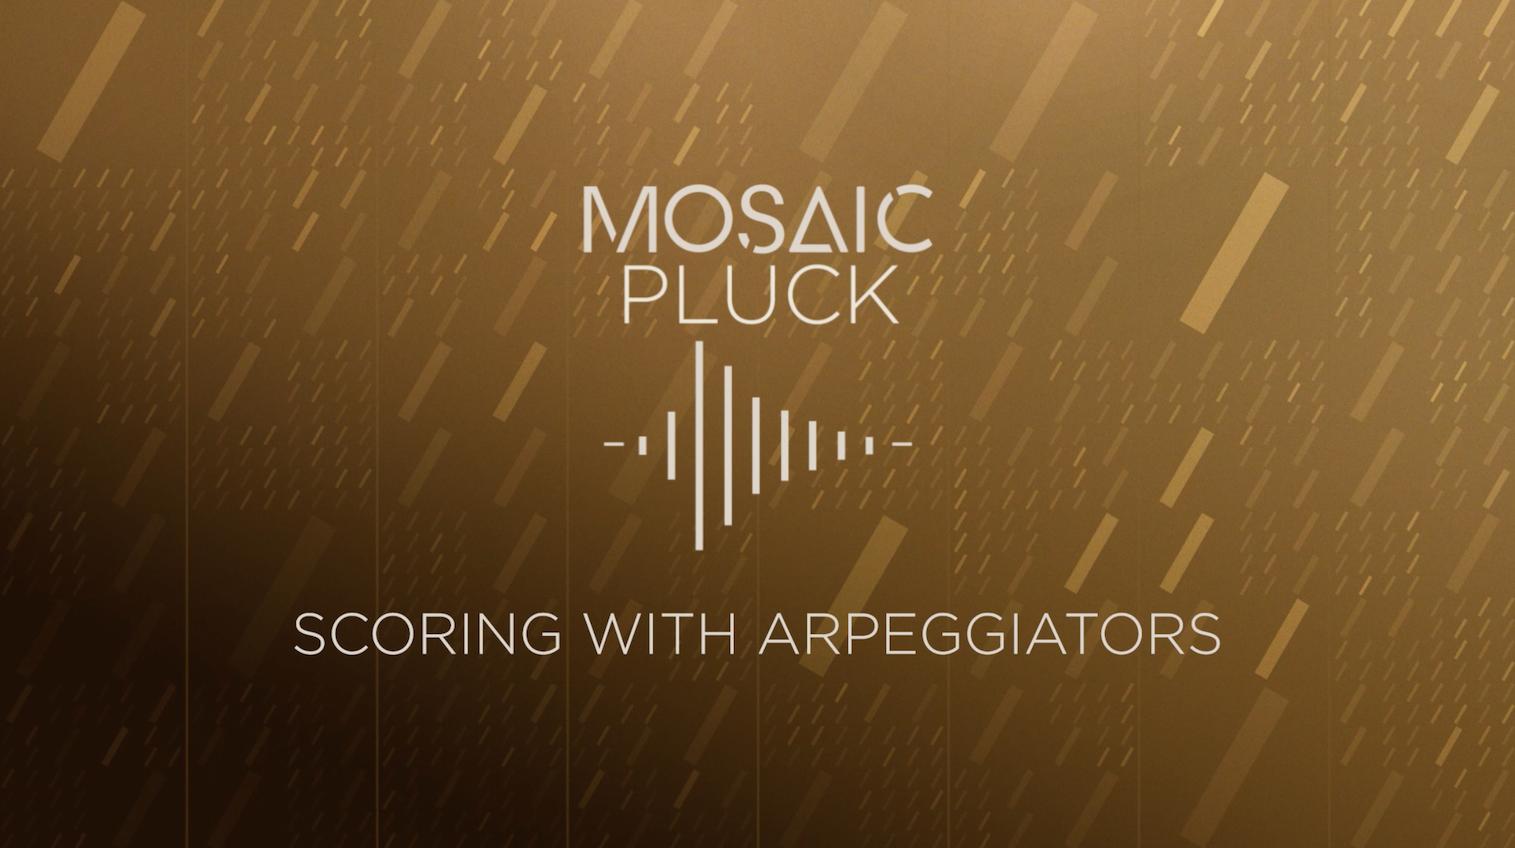 Heavyocity – Mosaic Pluck (KONTAKT) Crack Free Download